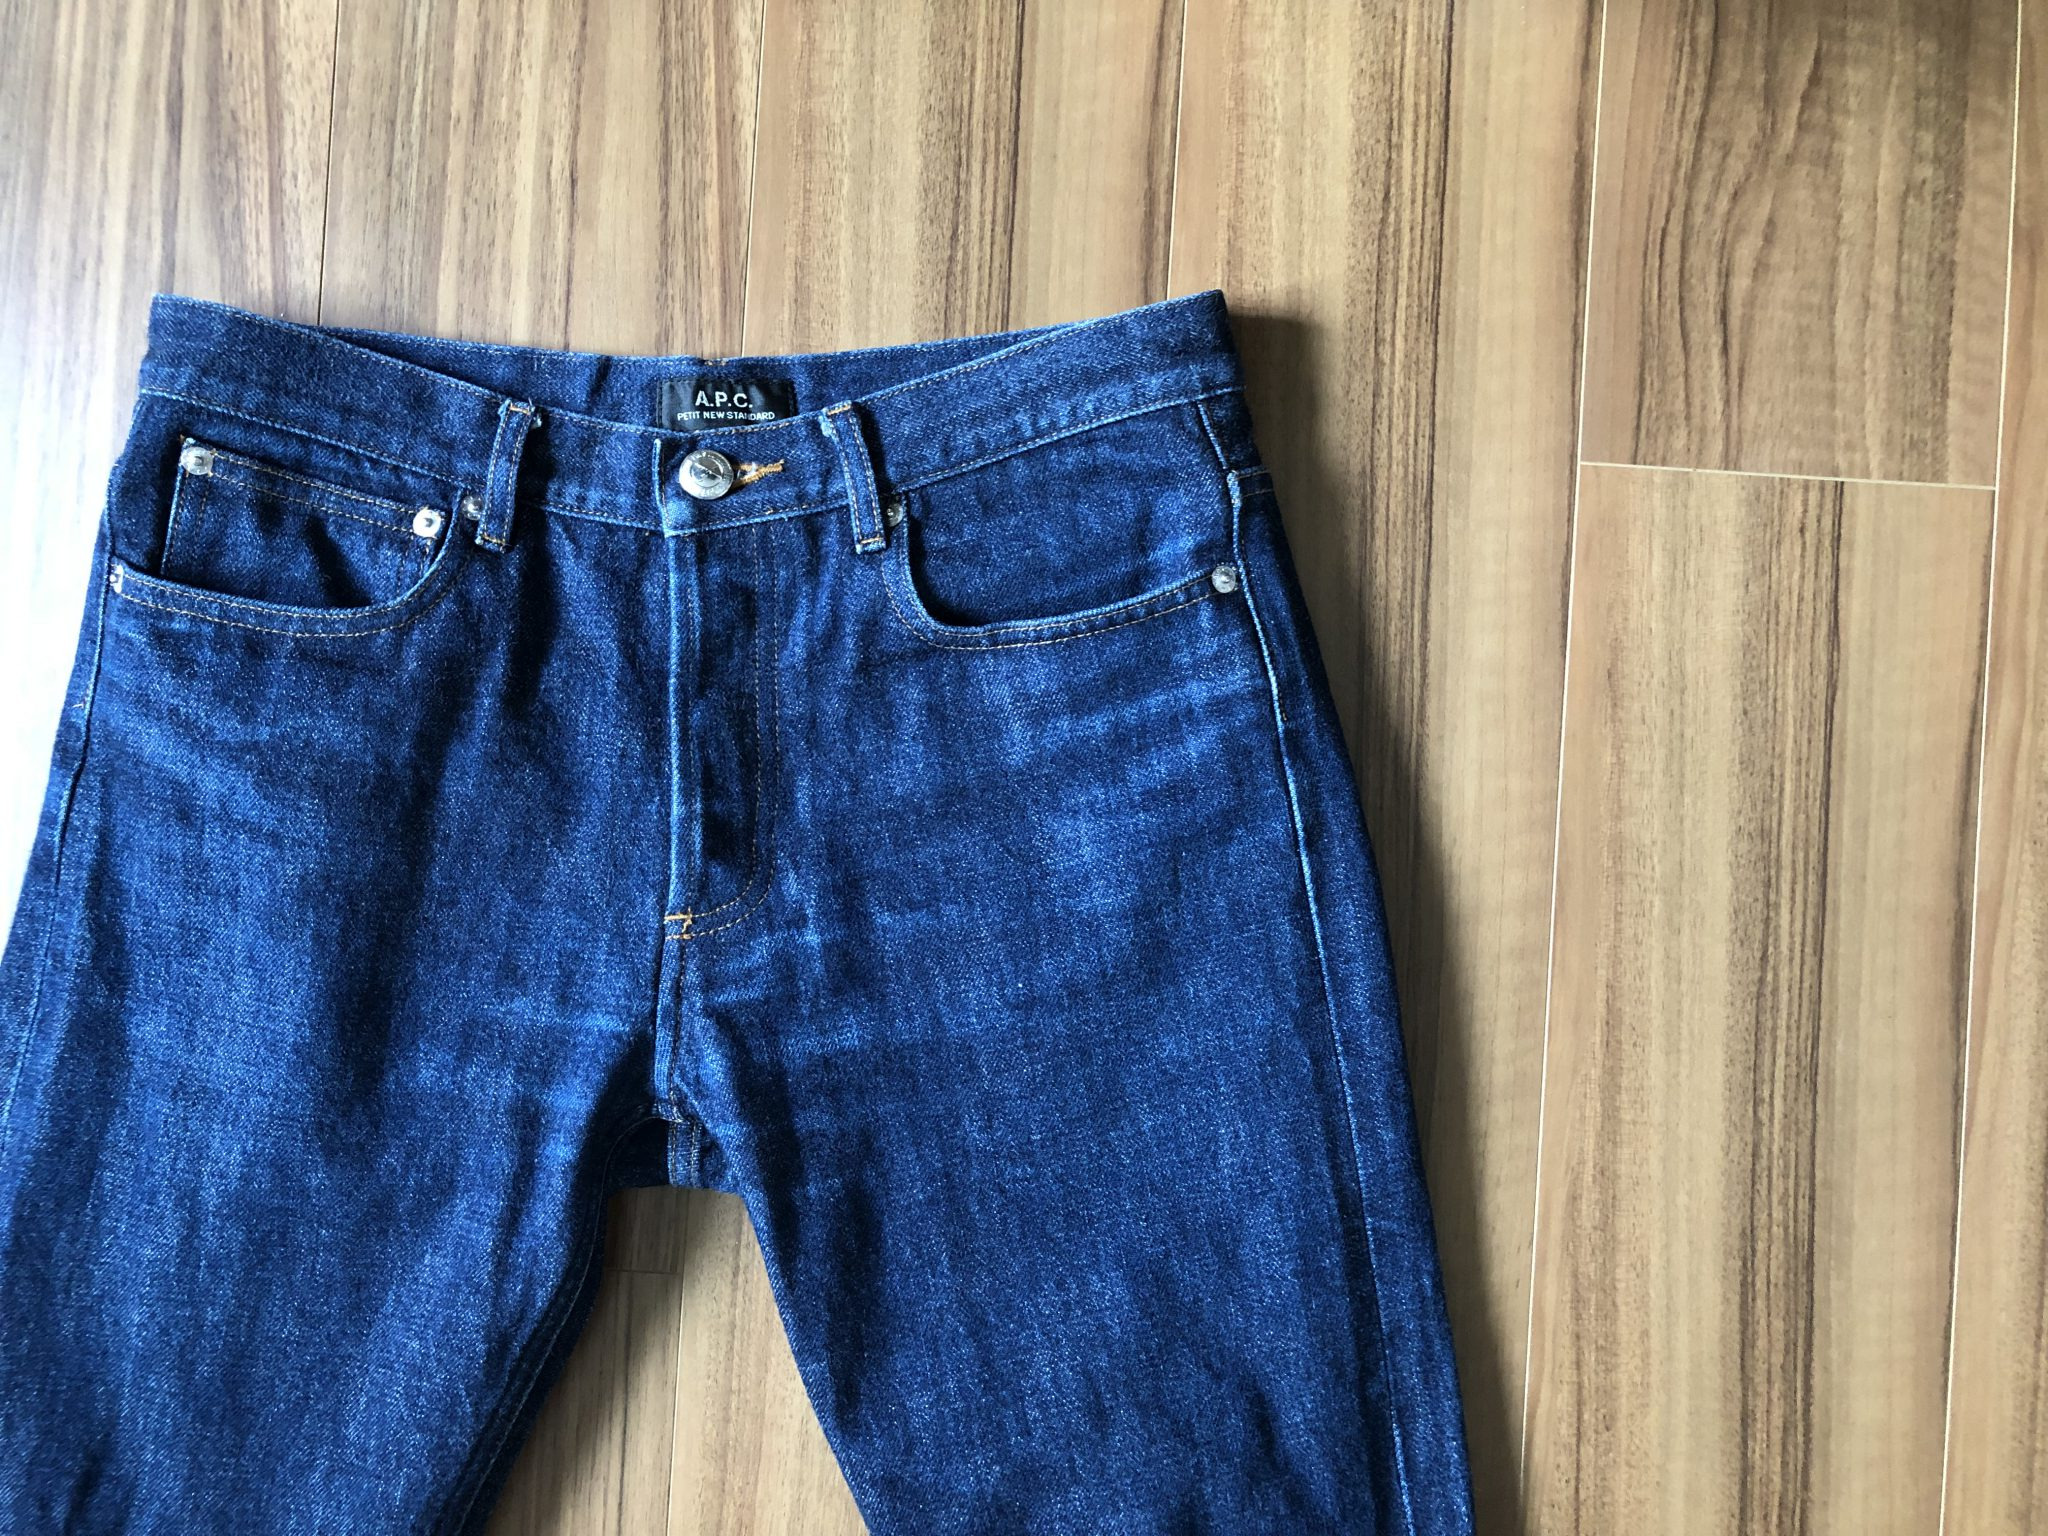 A.P.C. Petit New Standard(プチニュー)size29|79日810時間穿いて8回目の洗濯~購入当時とエイジング(経年変化)を比較します